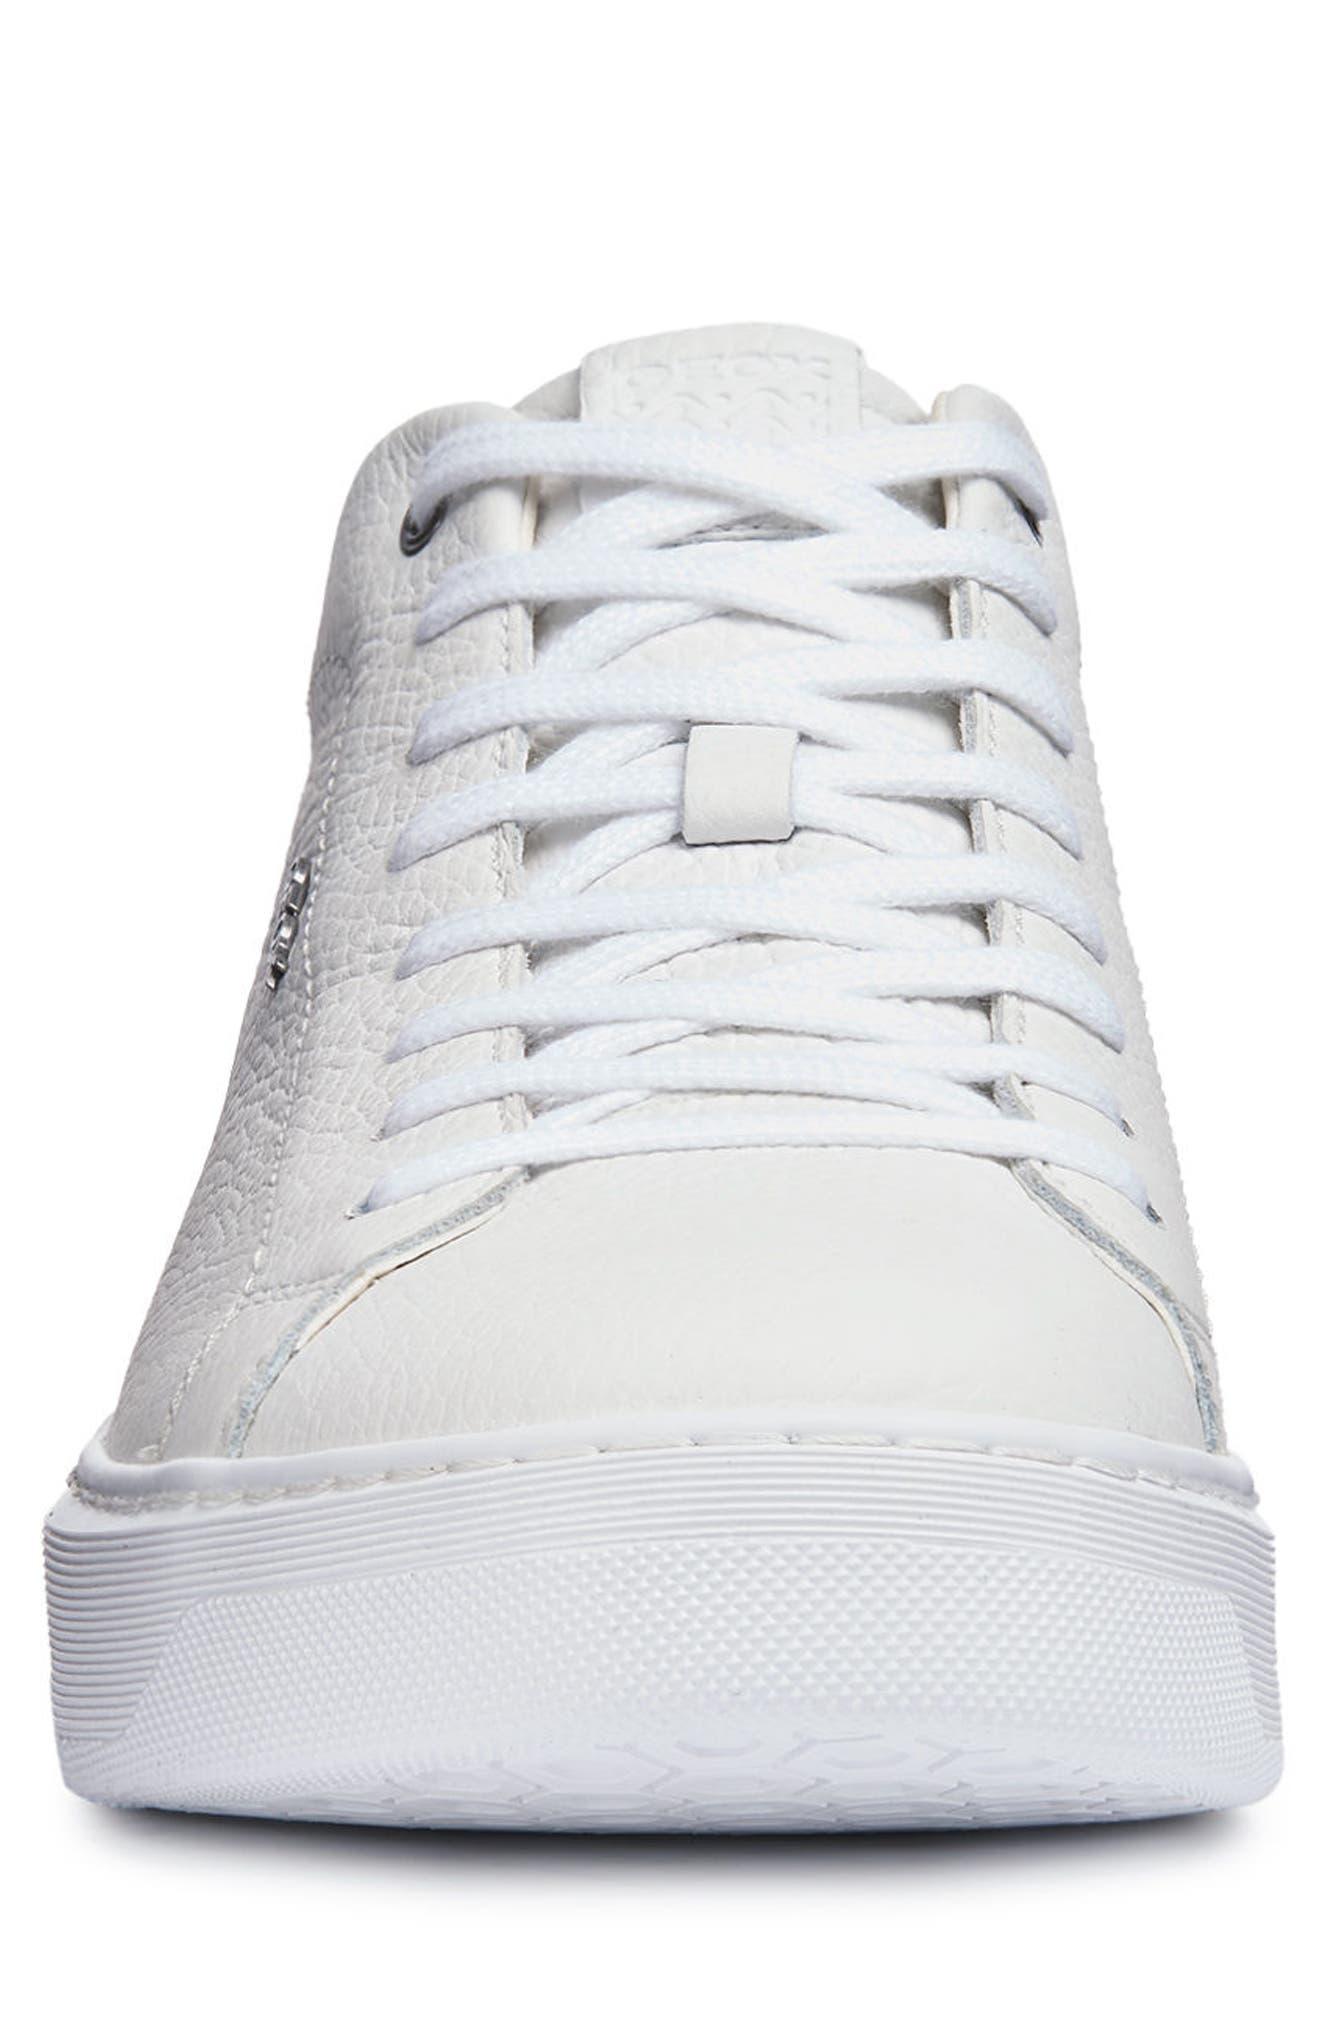 Deiven 3 Mid Top Sneaker,                             Alternate thumbnail 4, color,                             100